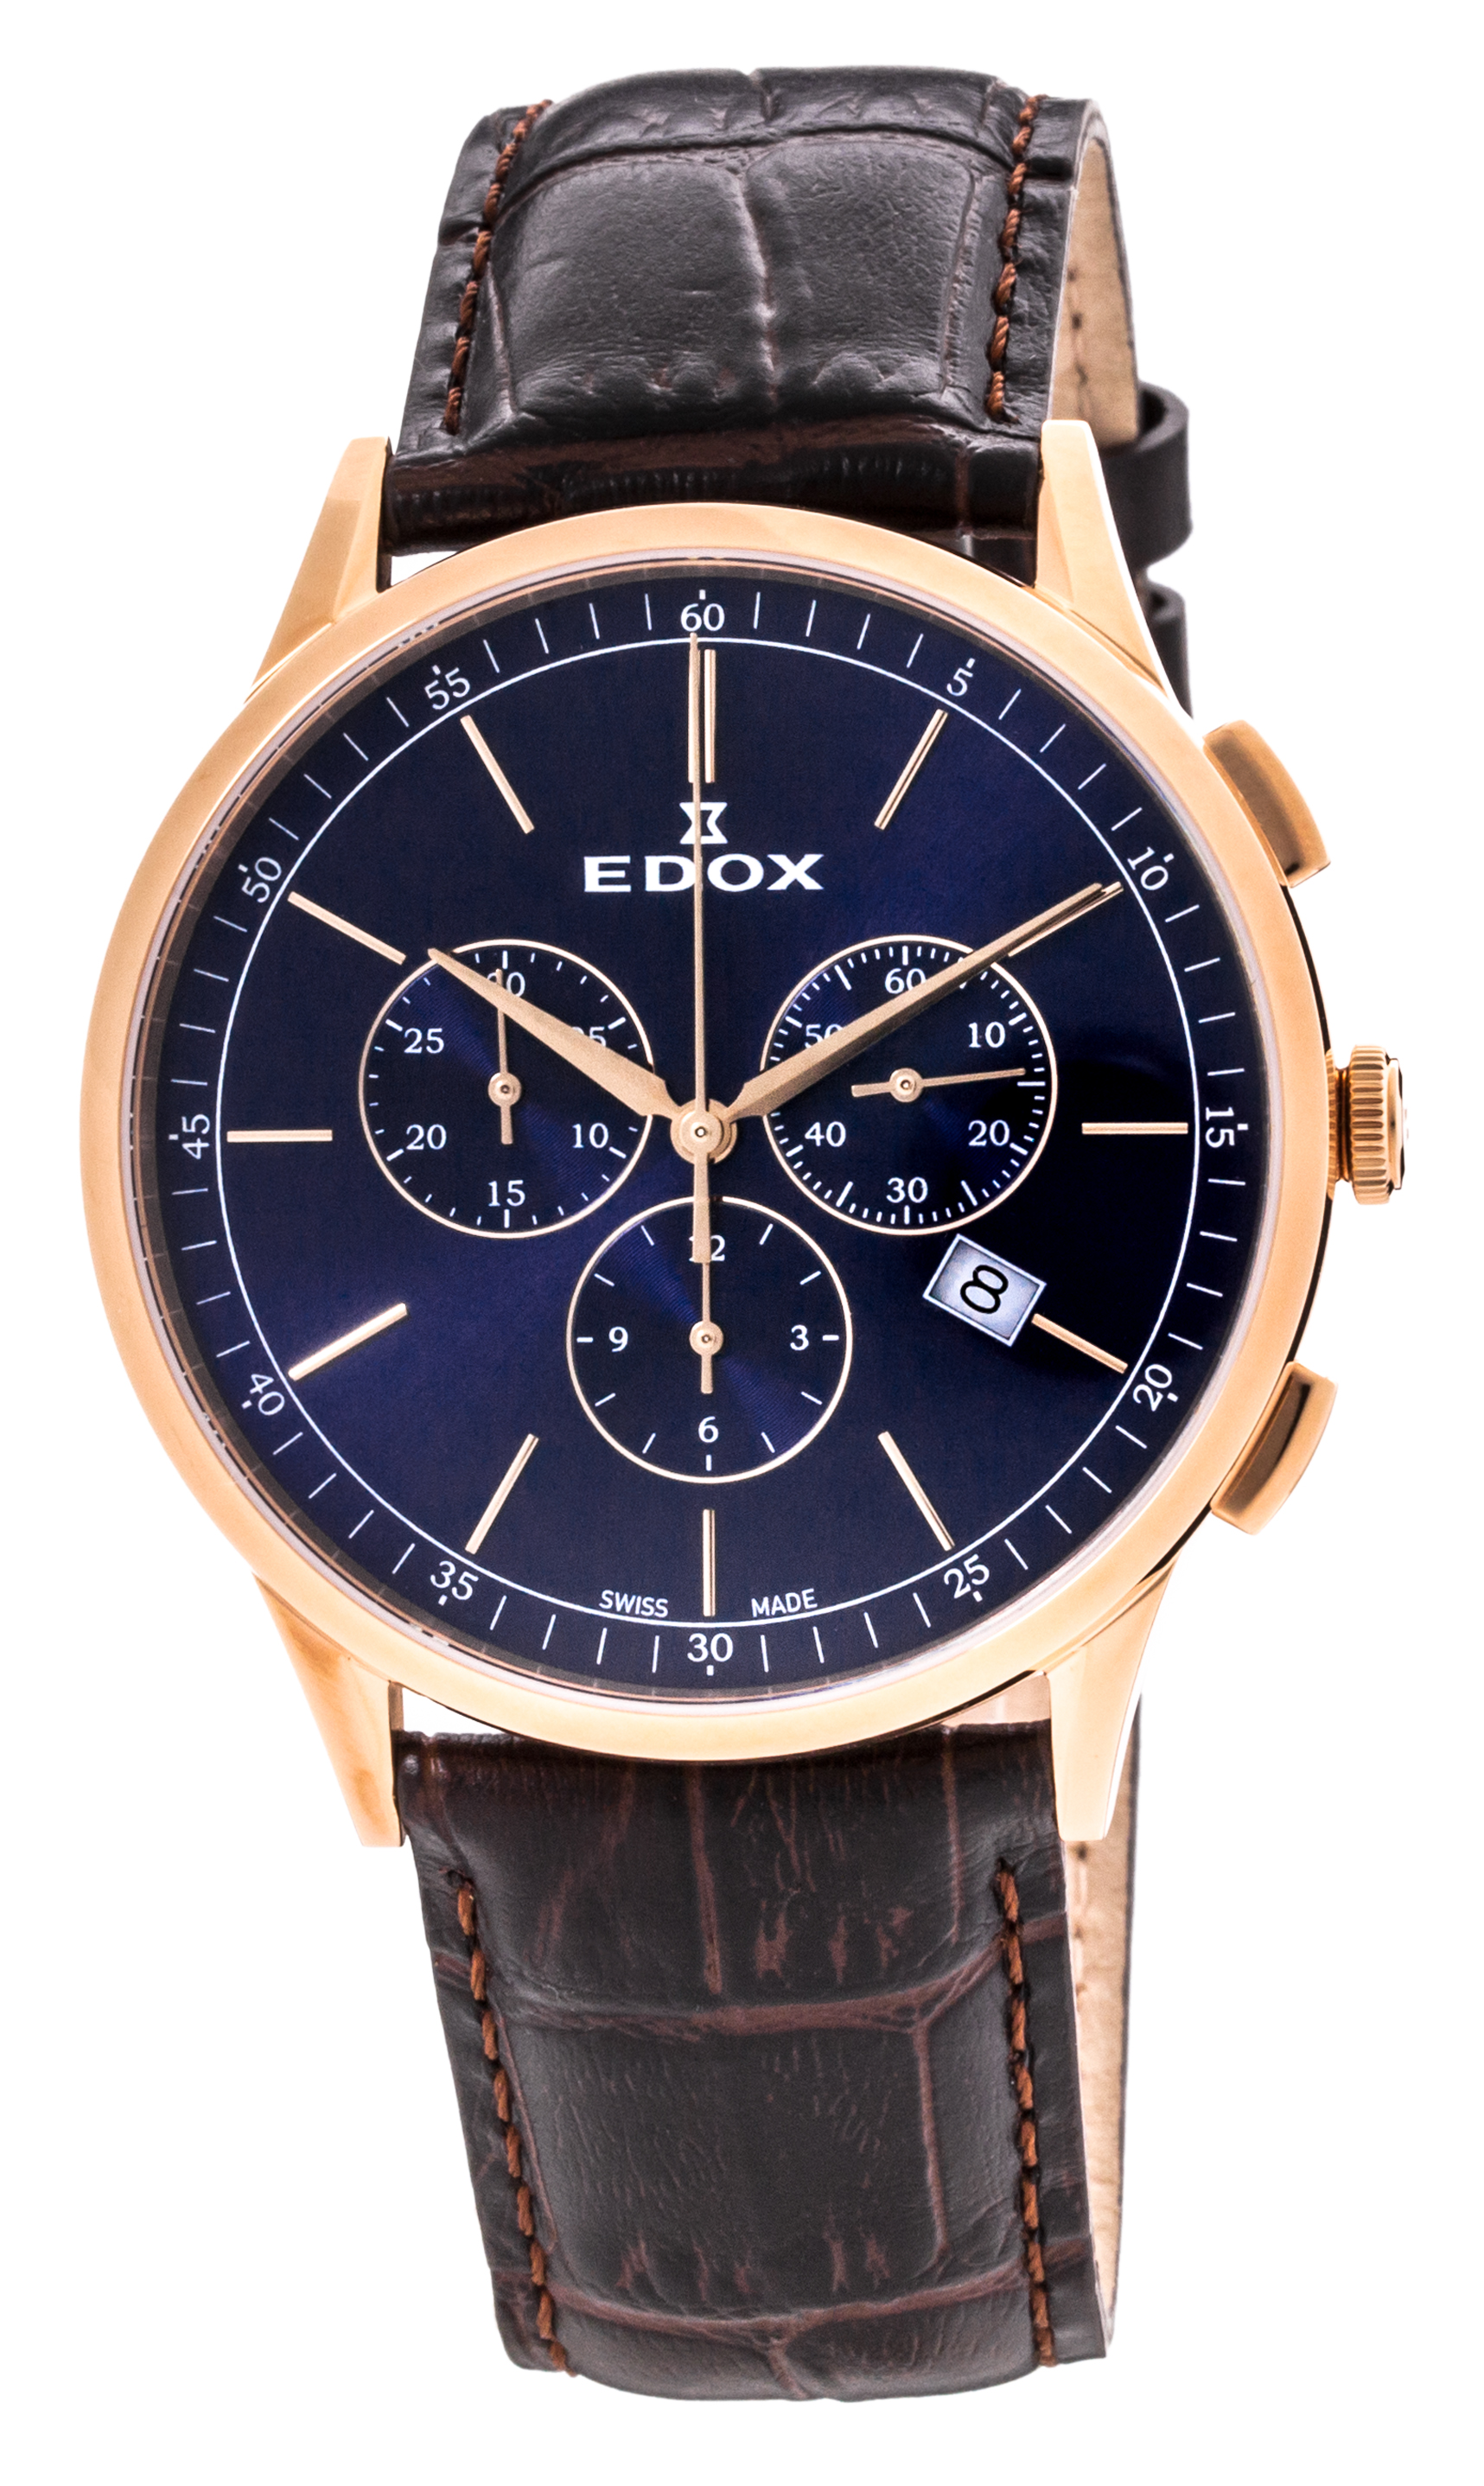 Edox Les Vauberts Chronograph Date 10236 37RC BUIR